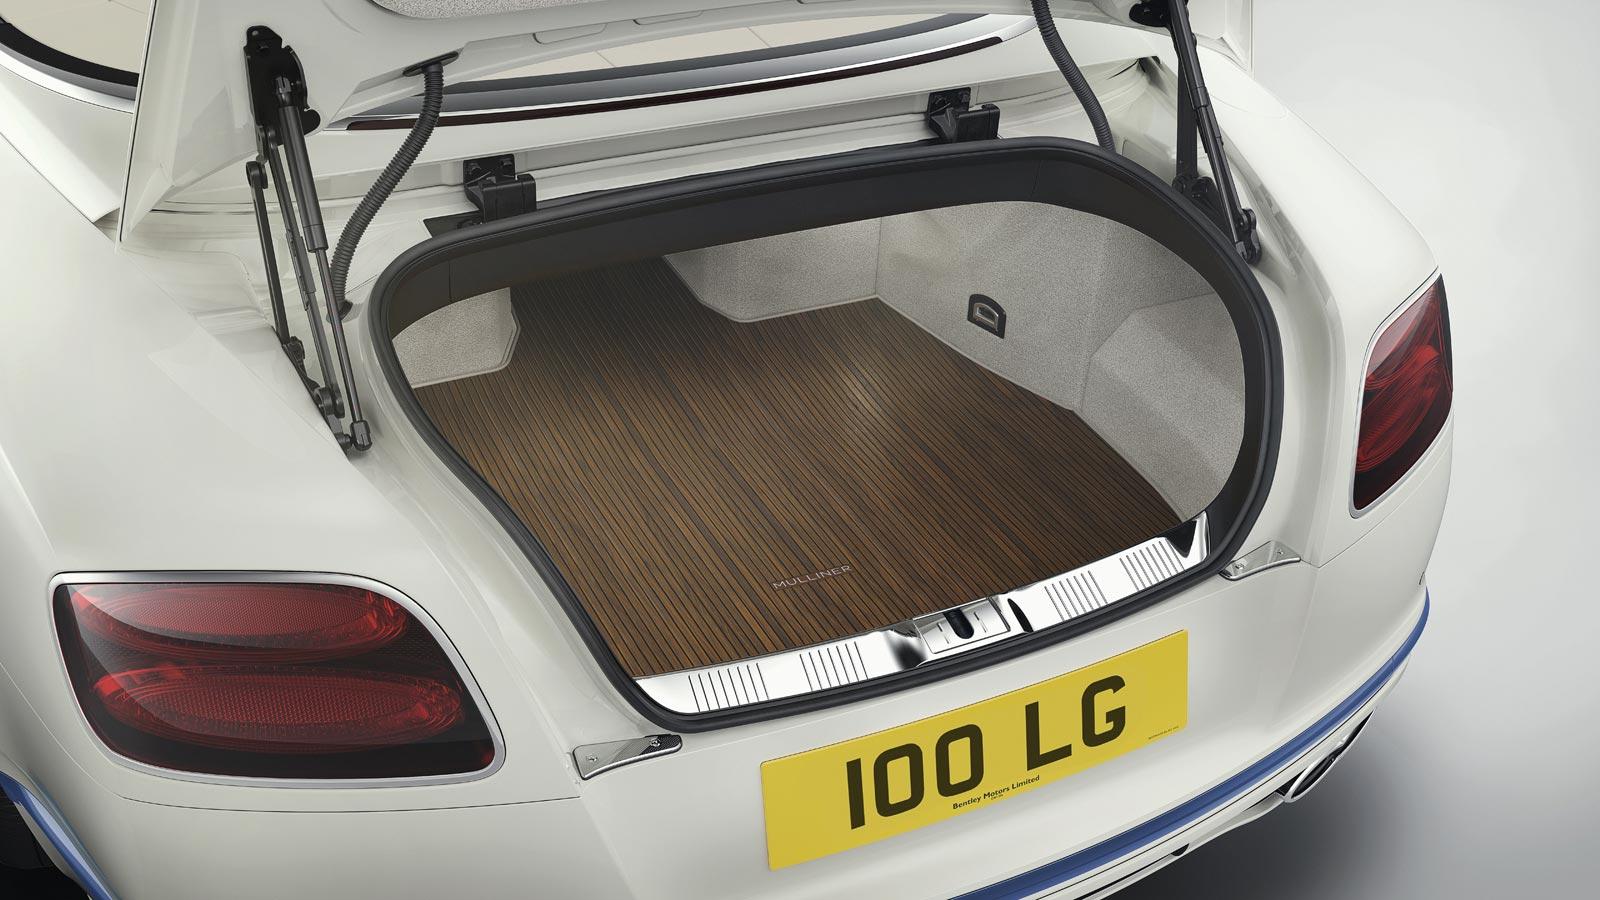 Bentley Motors and Princess Yachts Continental GT Convertible Galene Edition 10